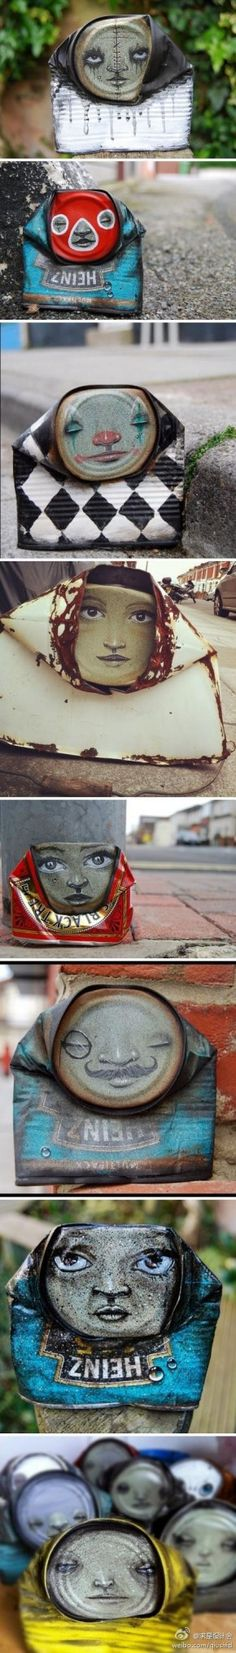 blik art awsome.